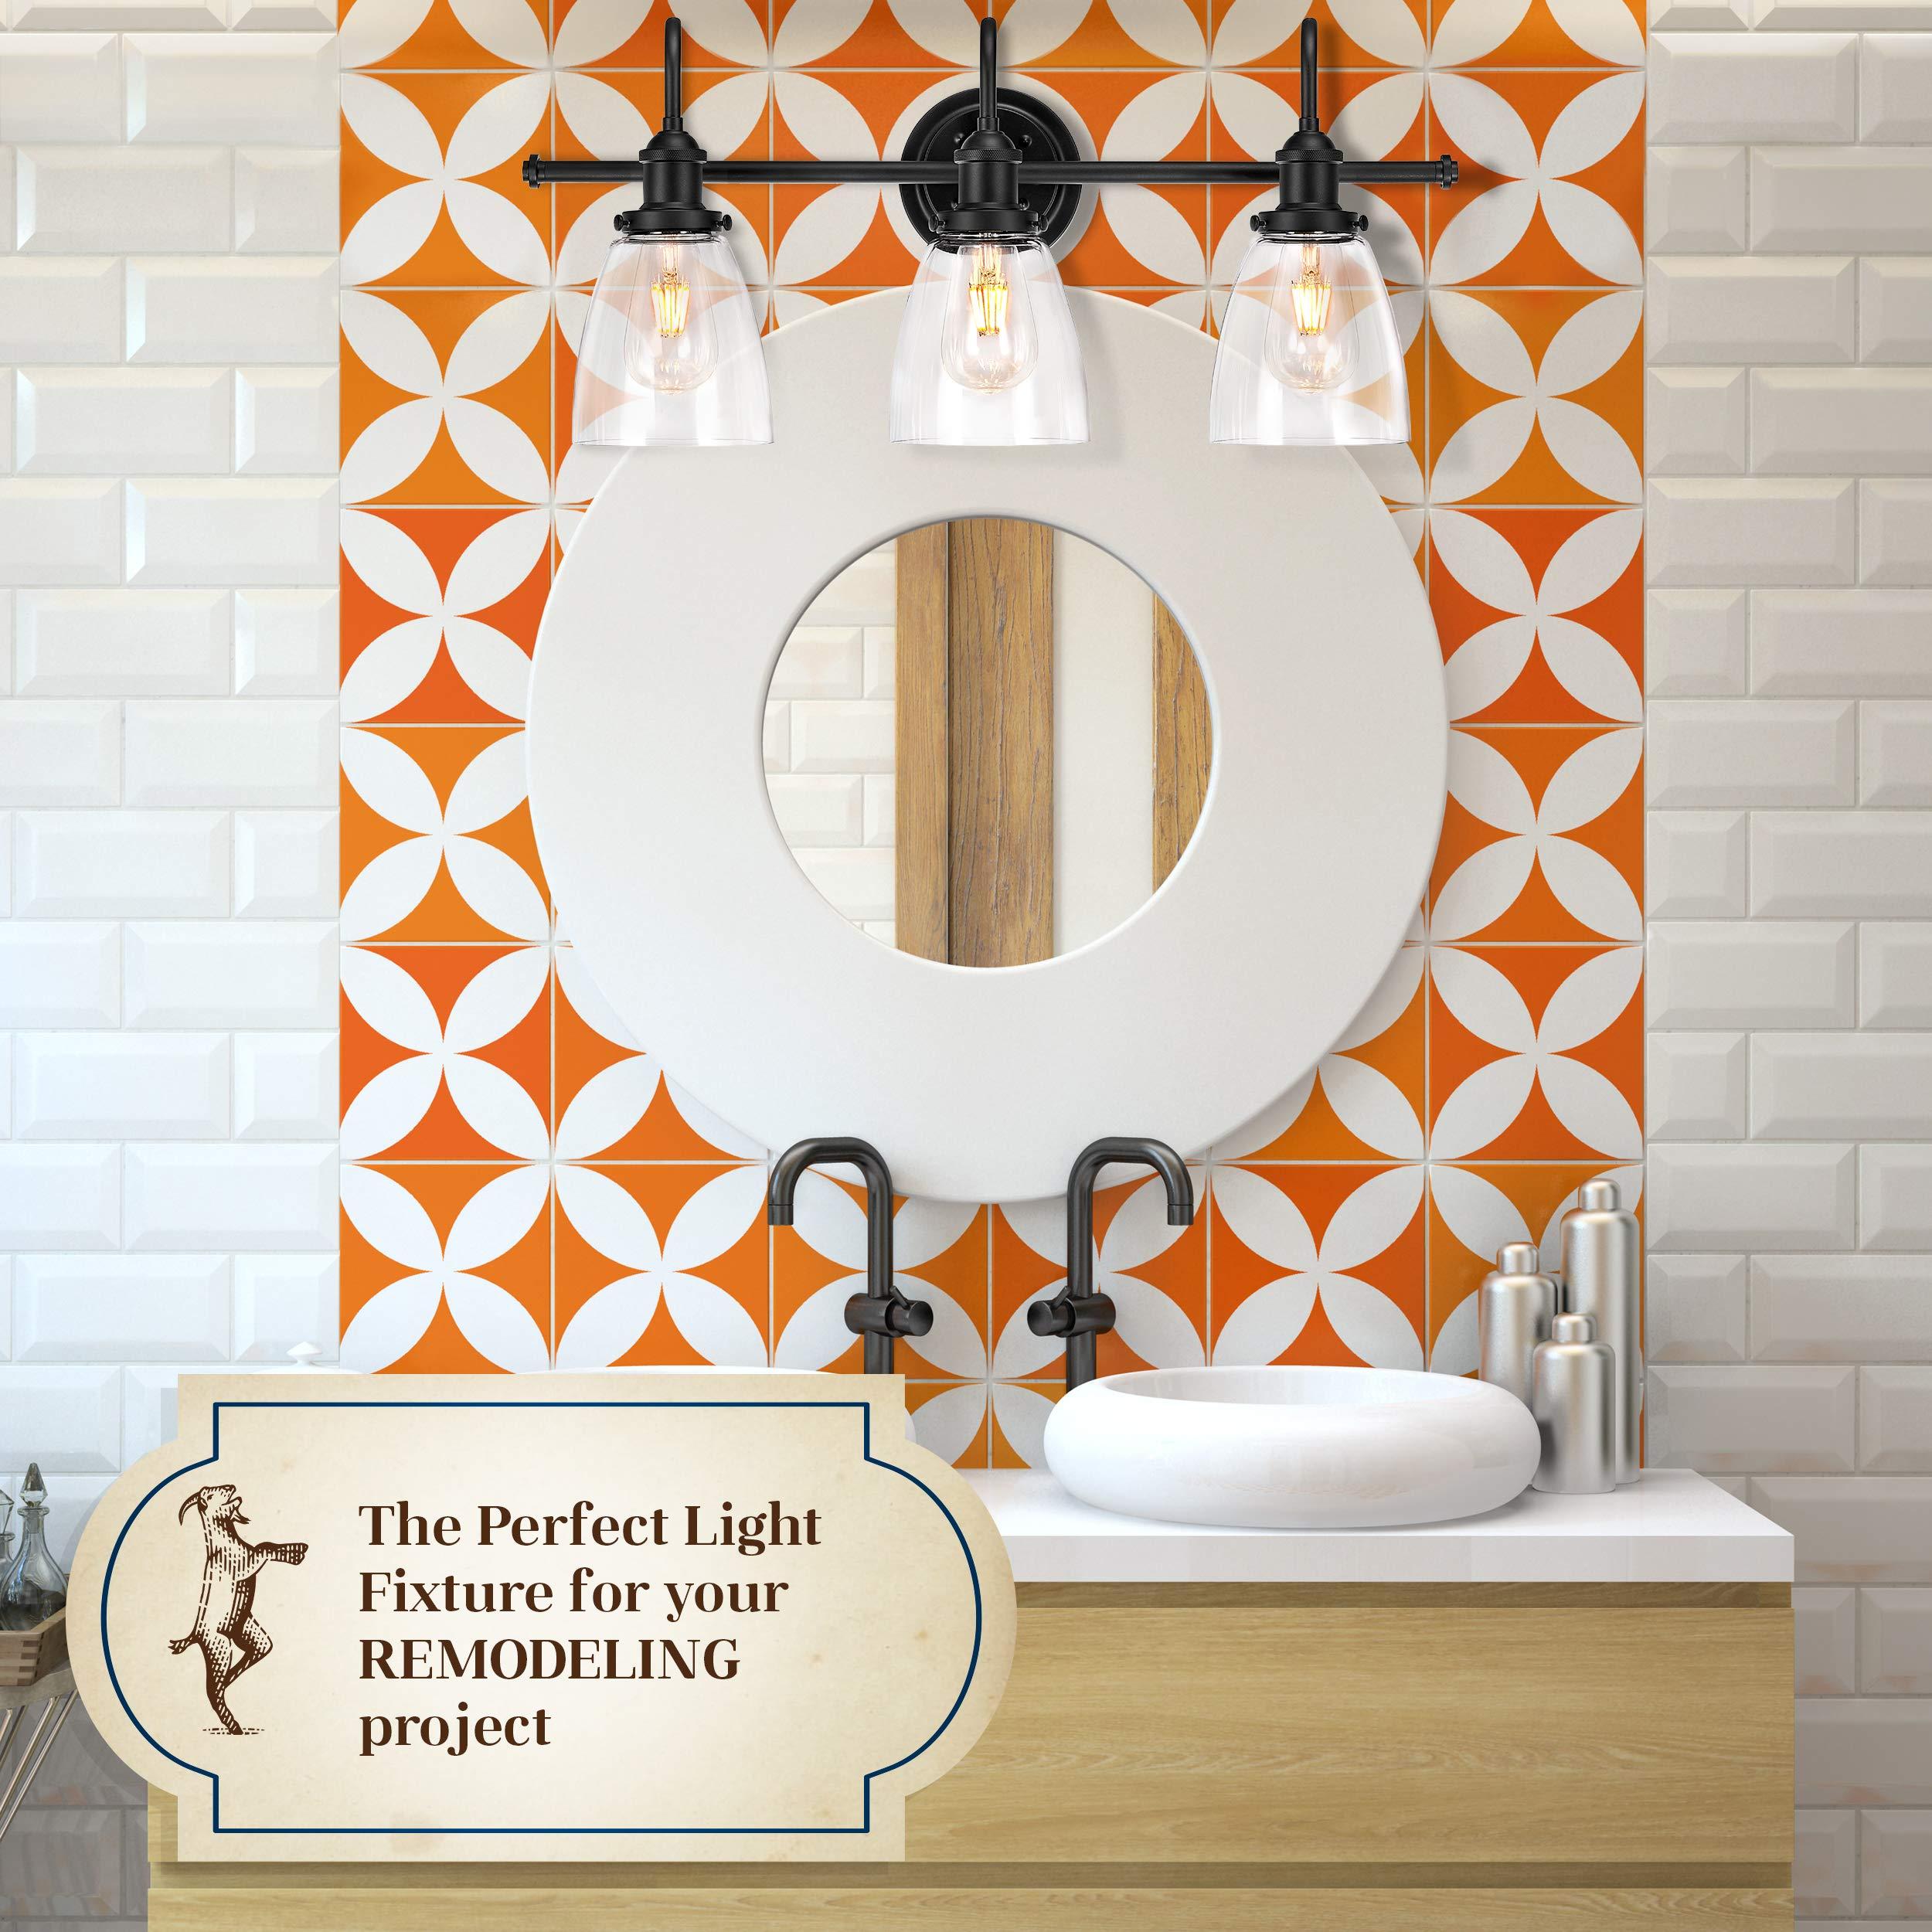 Bathroom Light Fixture - Farmhouse, Vintage, Industrial - 3 Light Bathroom Black Vanity Light Fixture by The Yodeling Goat (Image #3)